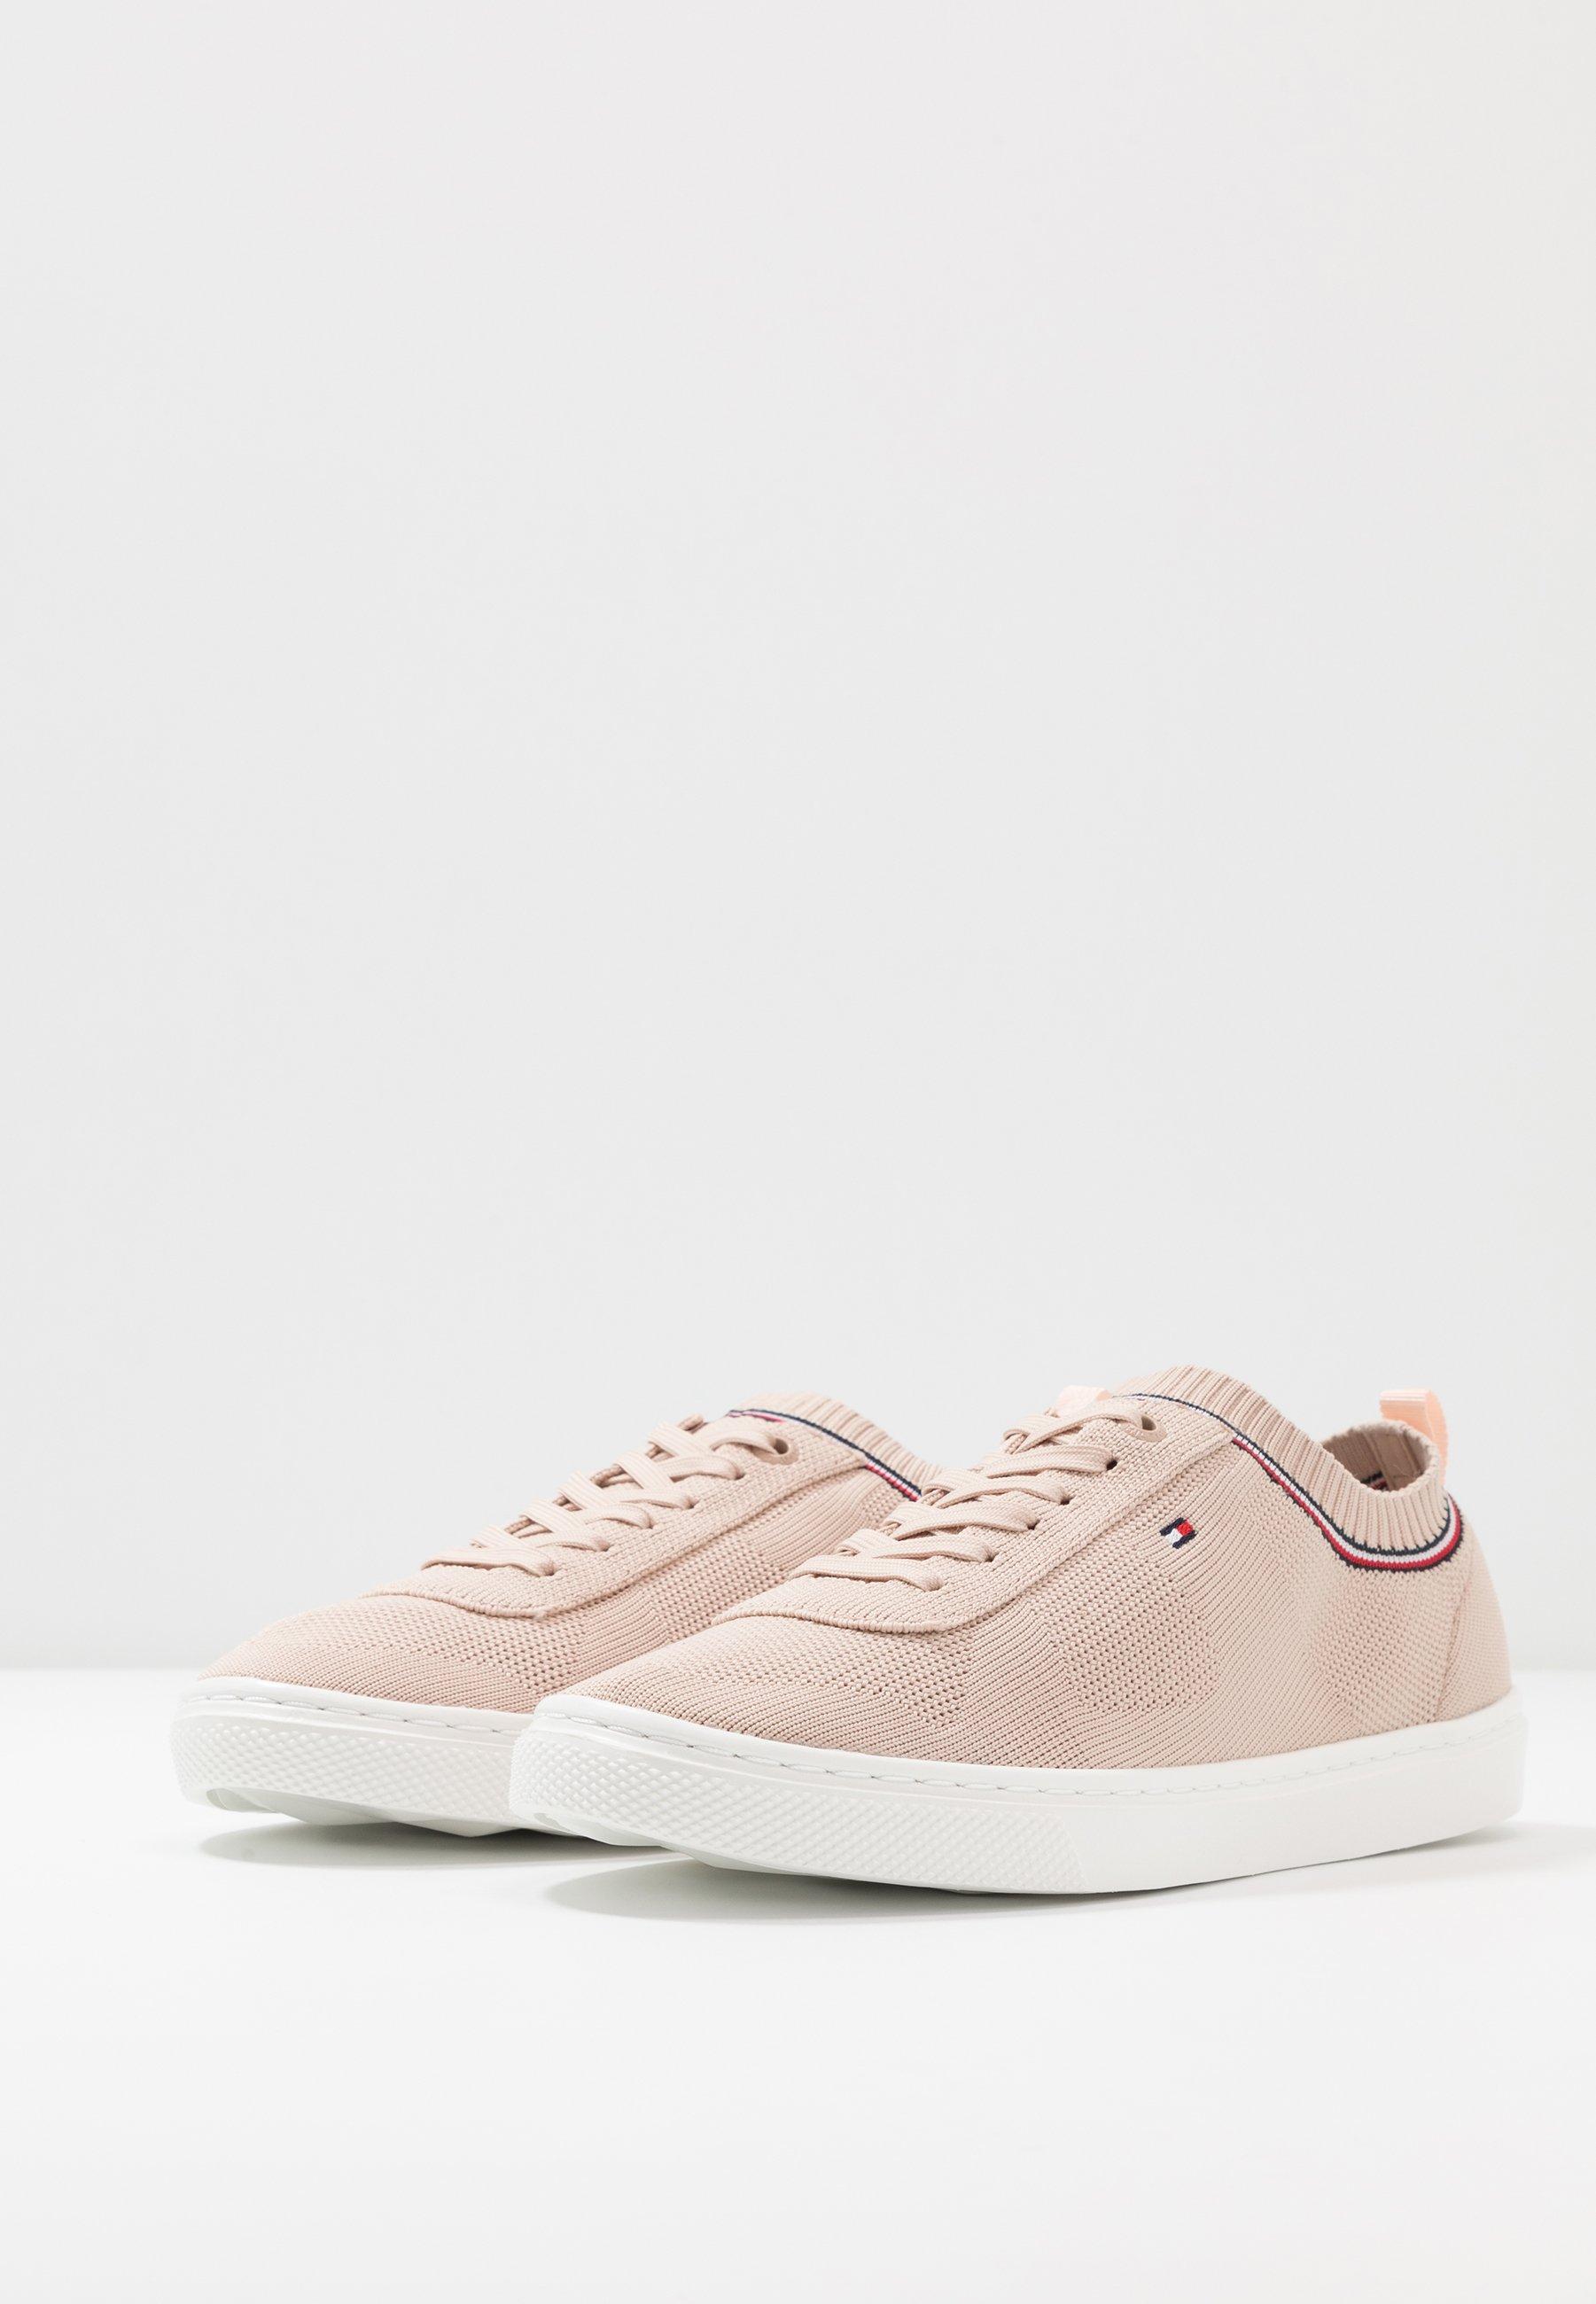 Tommy Hilfiger Sneakers Laag - Cameo Goedkope Schoenen